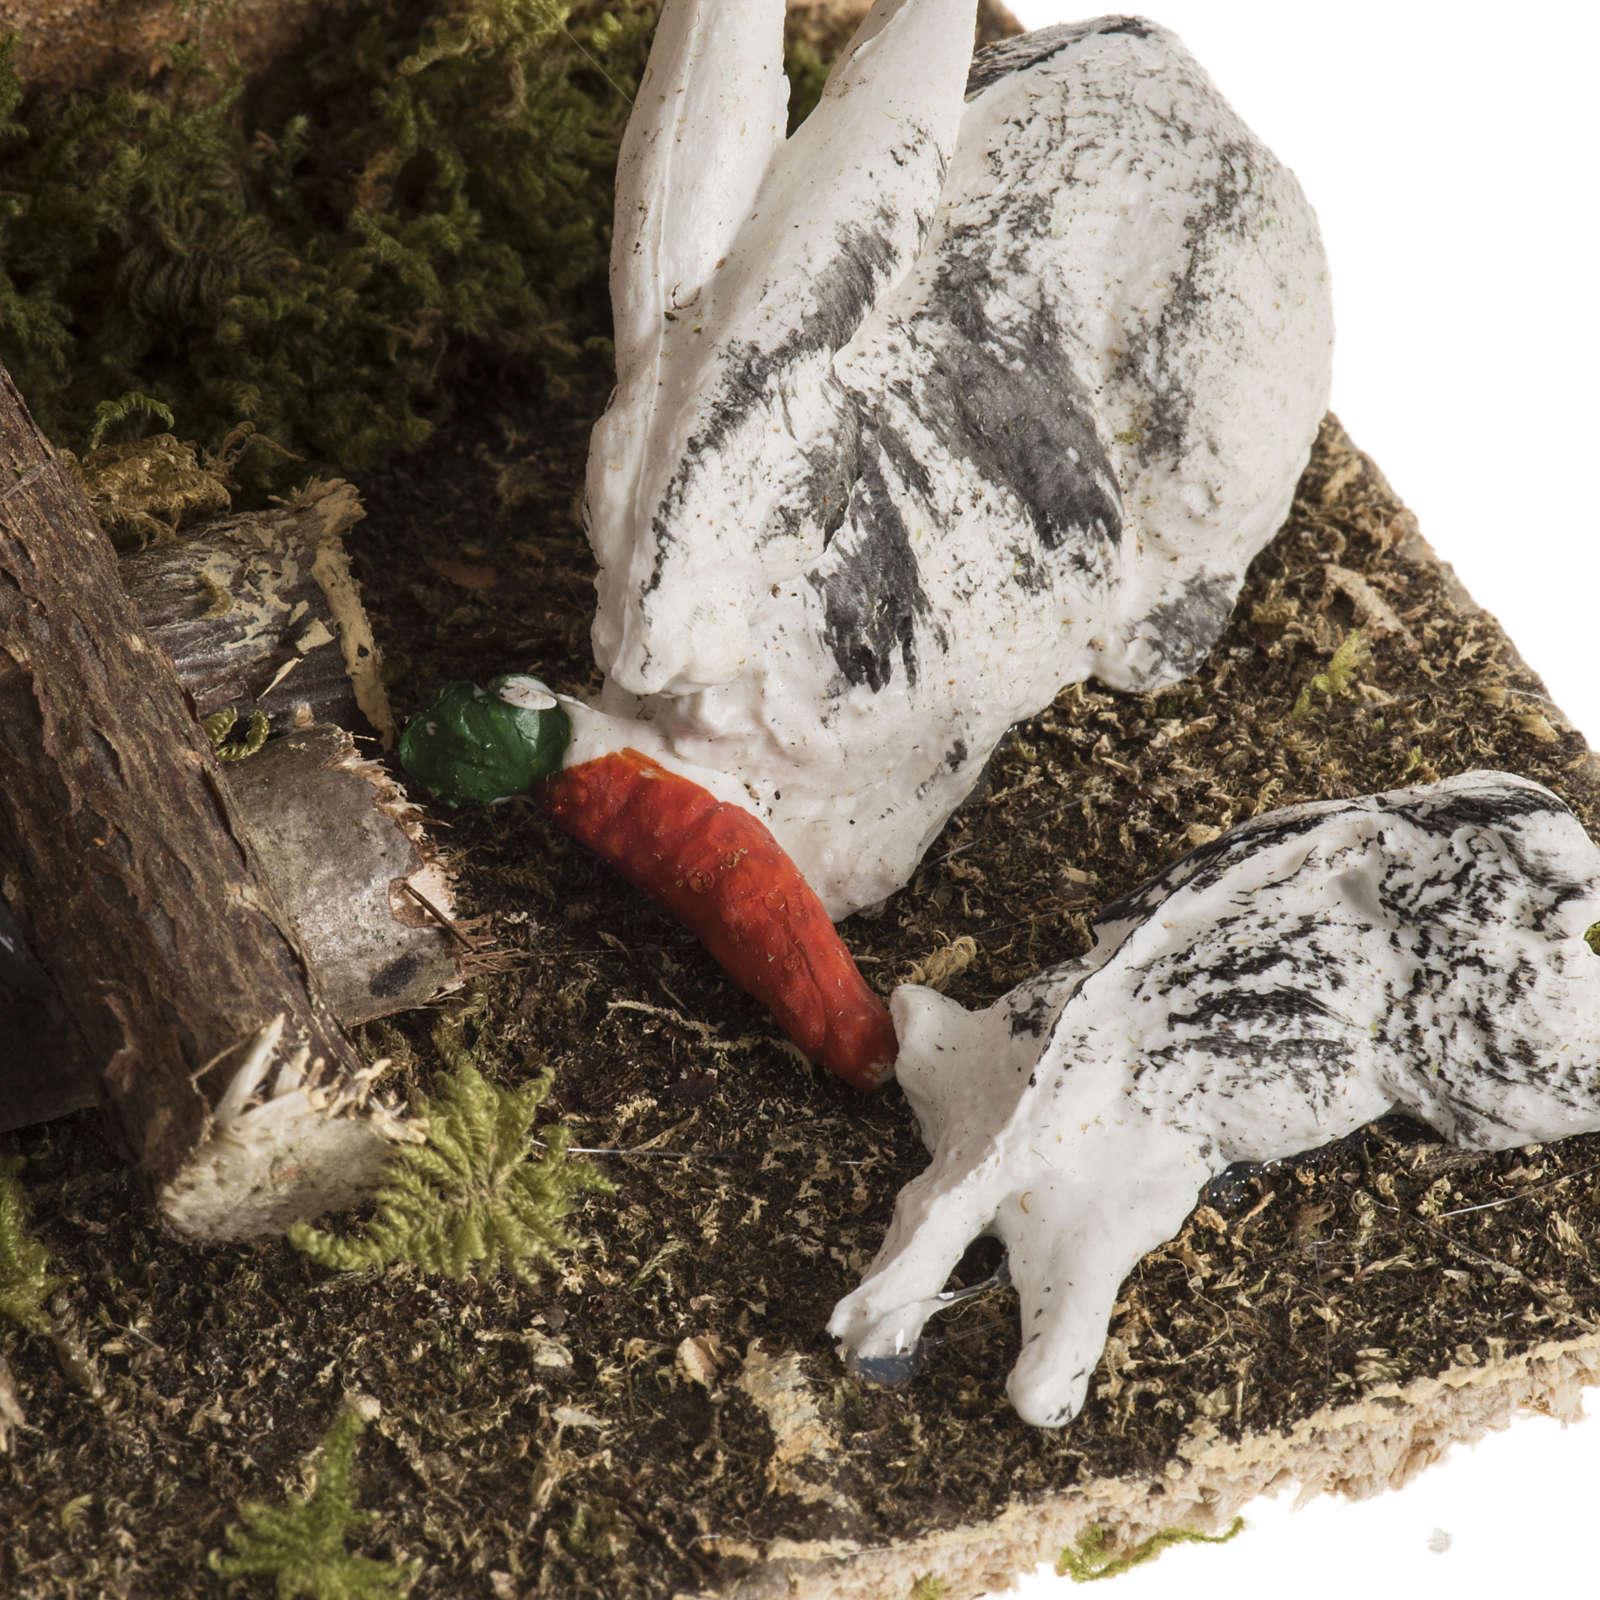 Conigli con conigliera 8-10 cm: ambiente del presepe 3